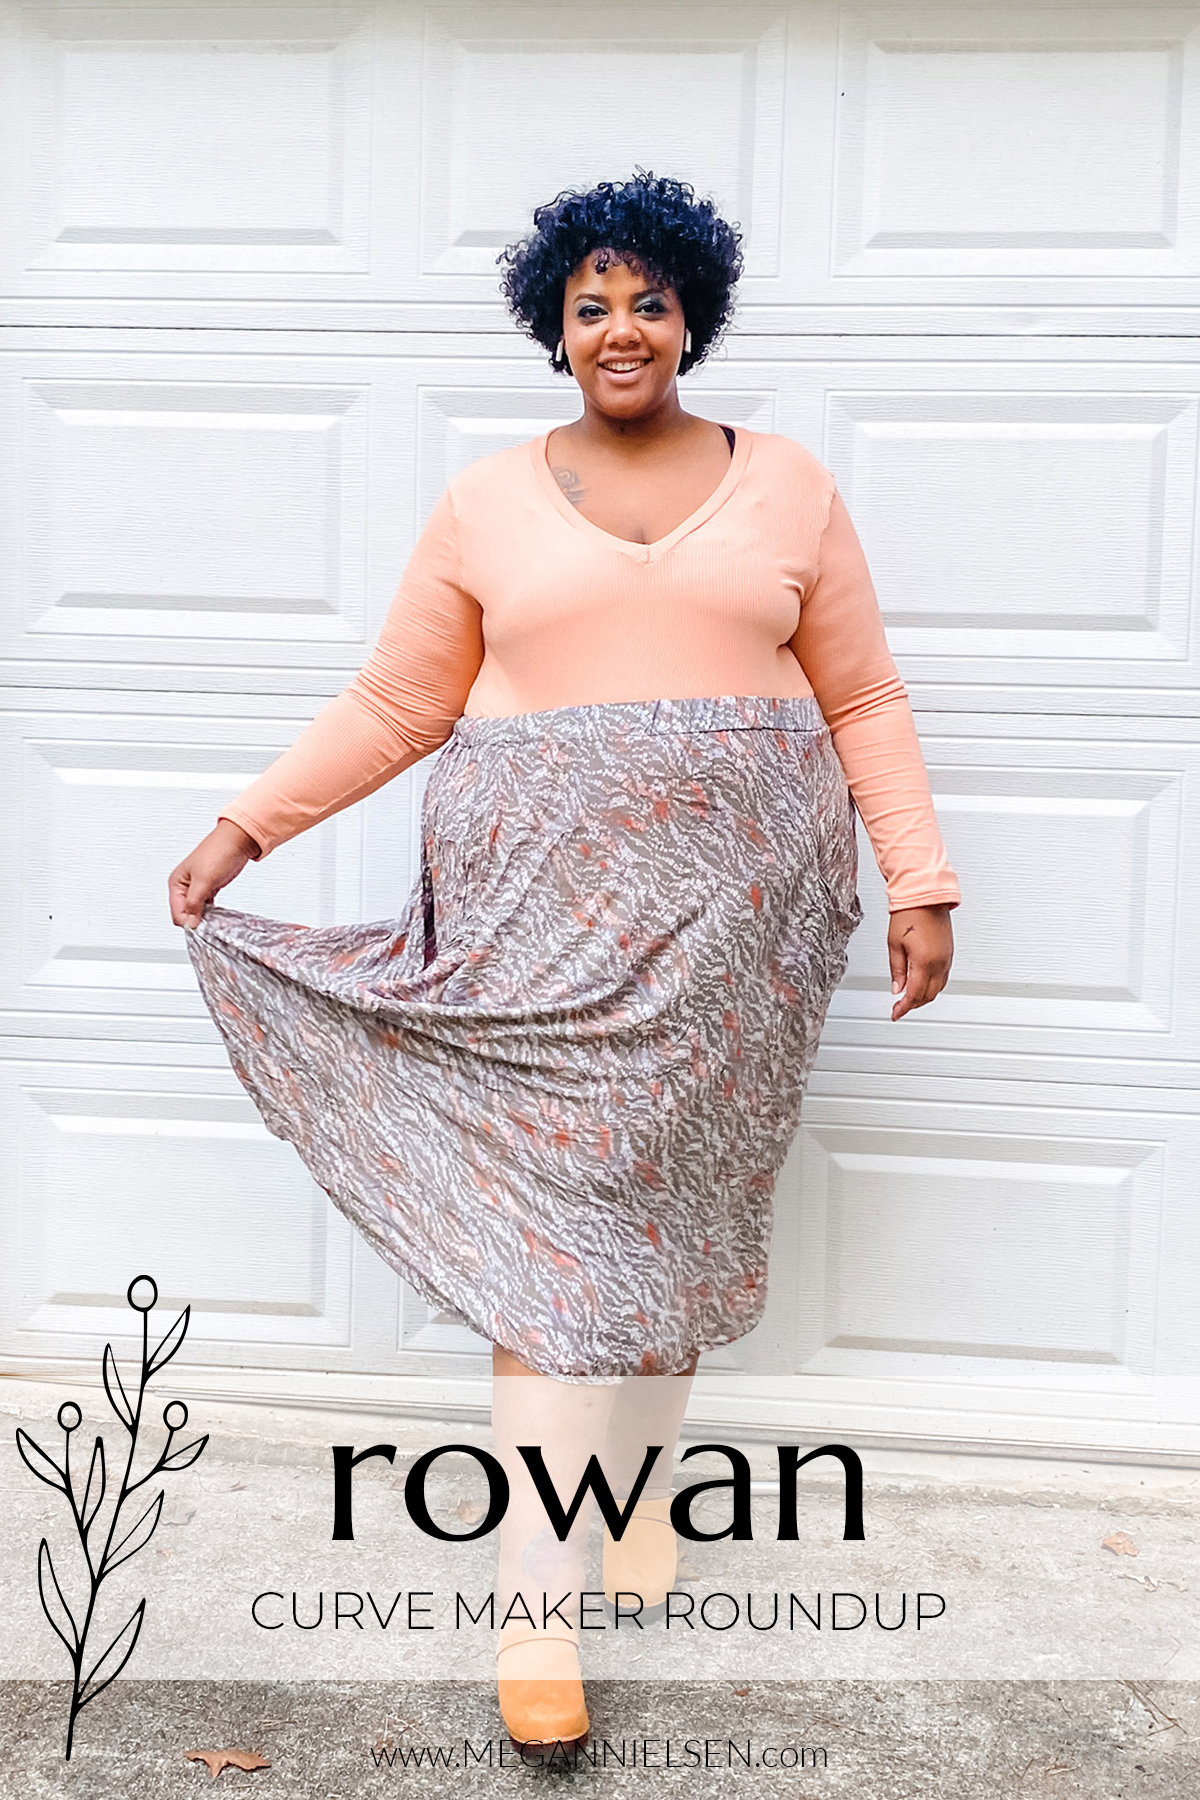 Rowan Curve Maker Roundup